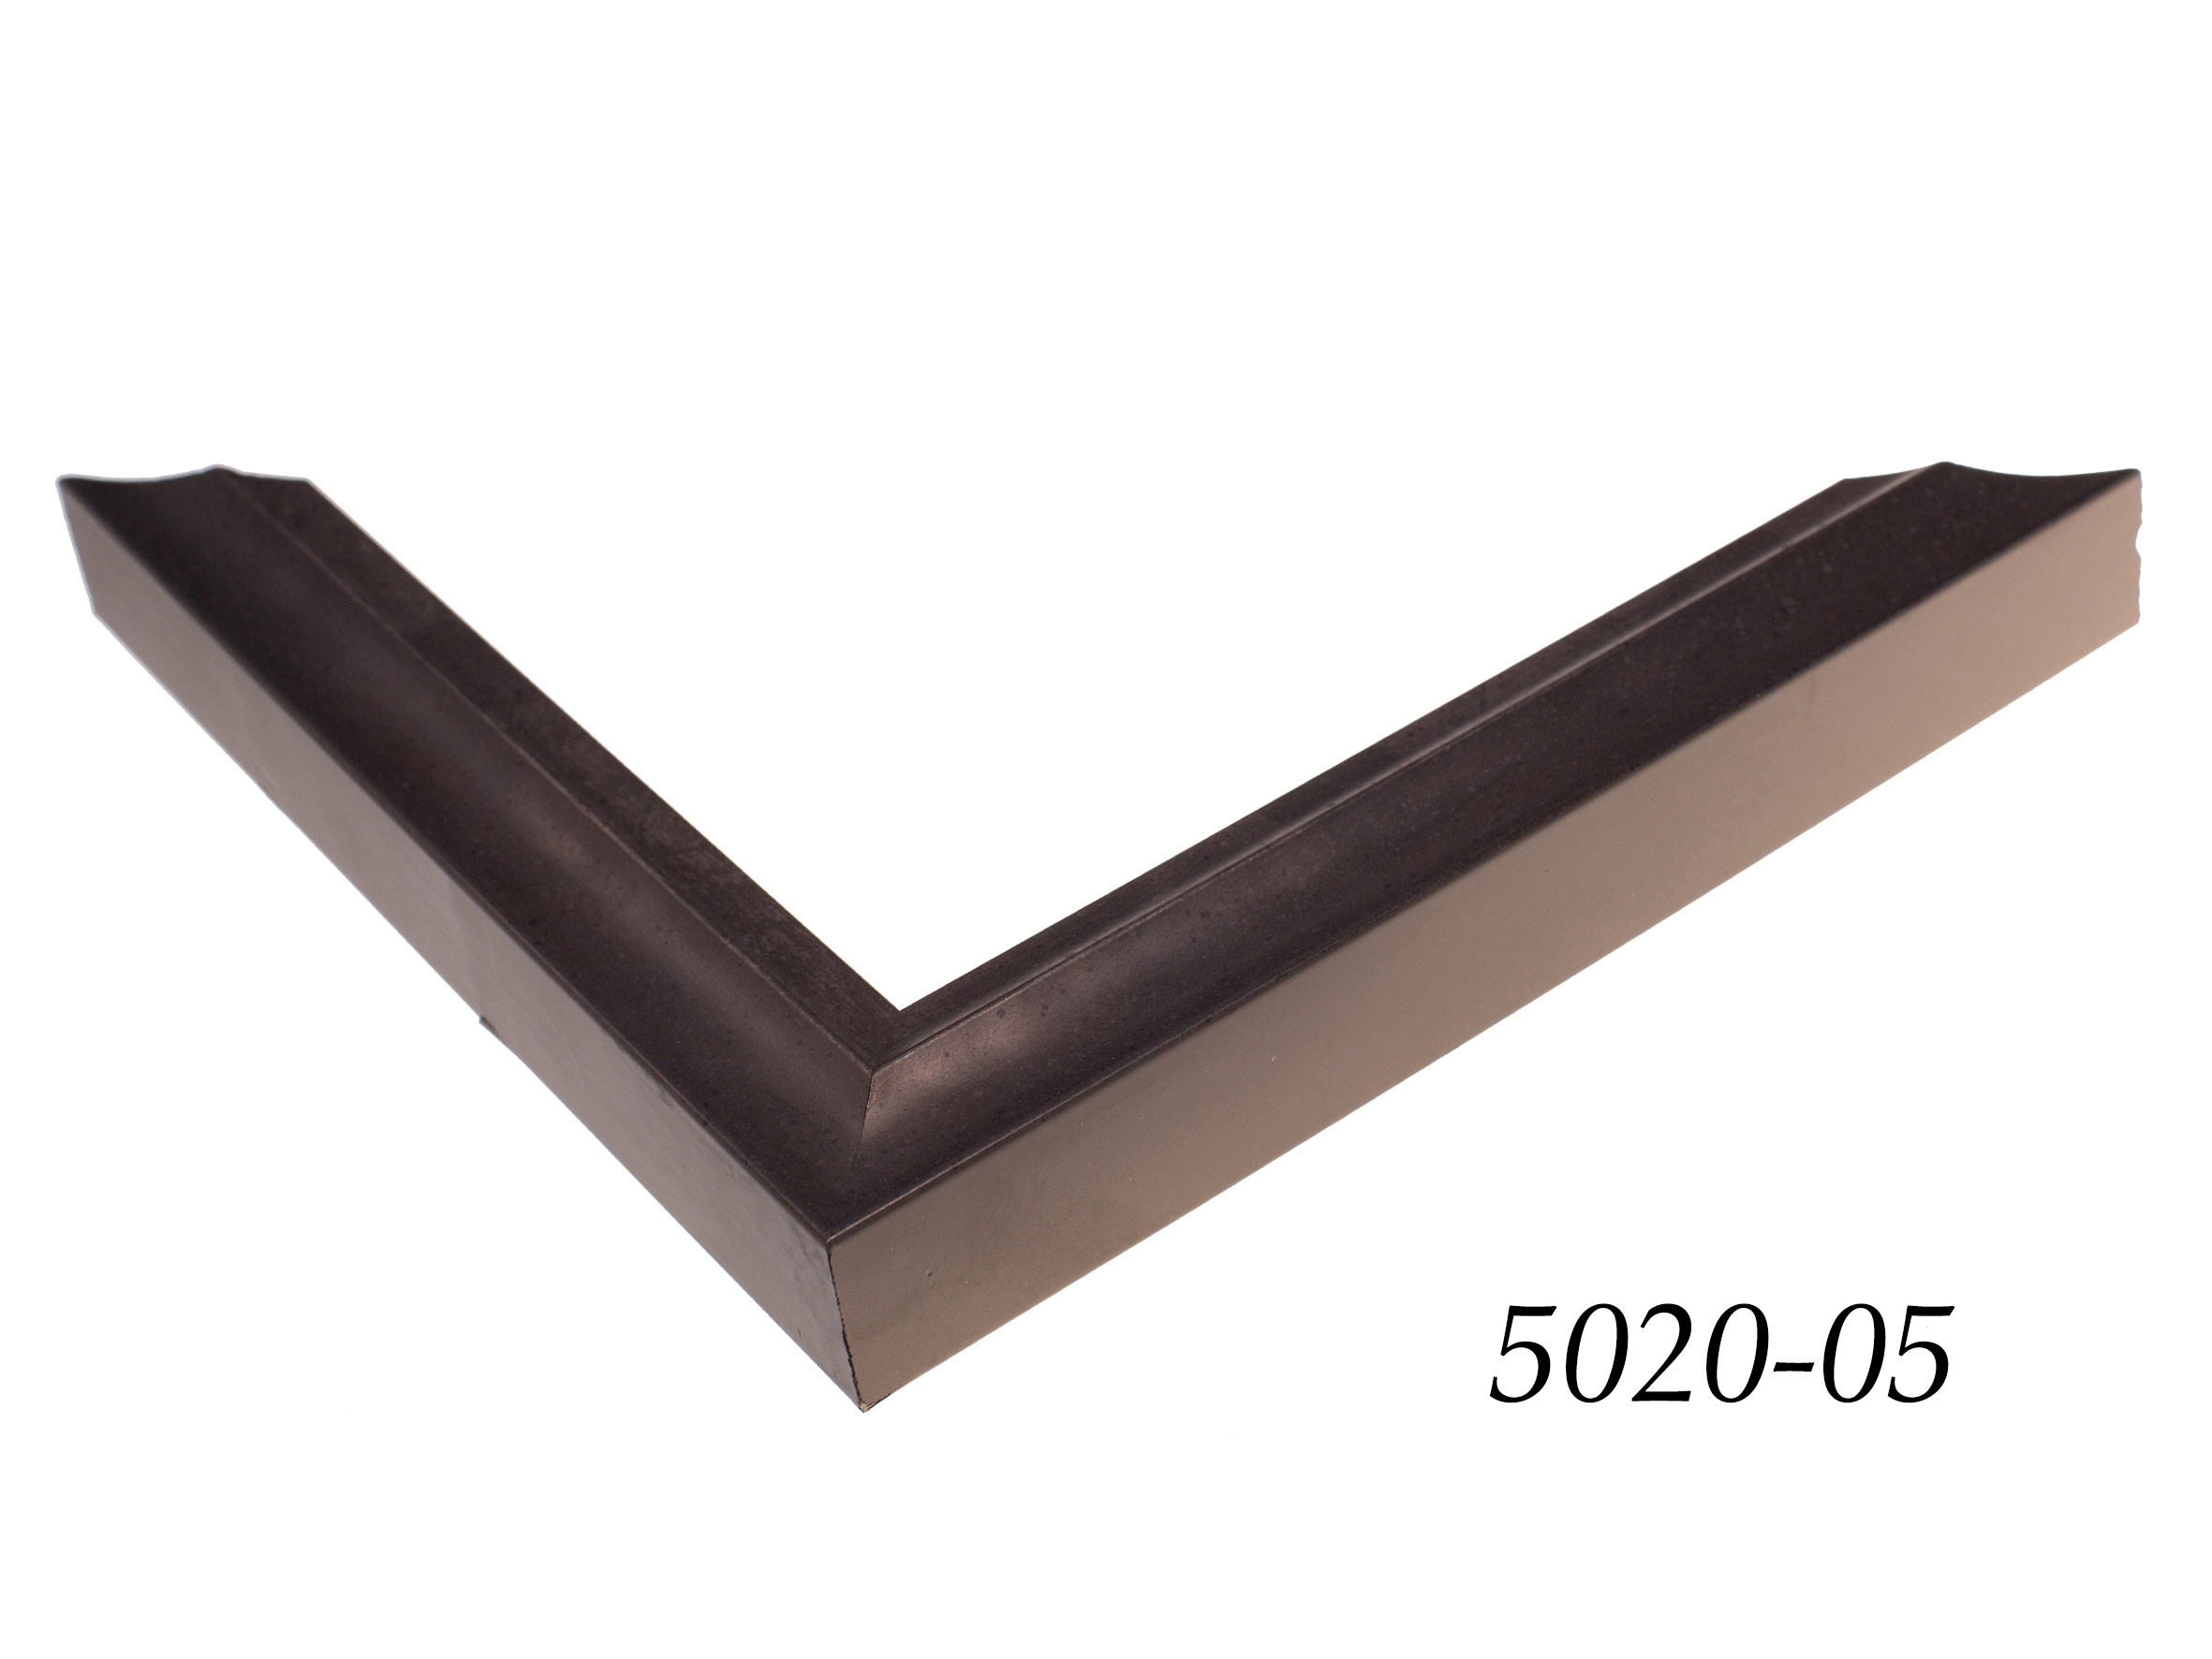 5020-05